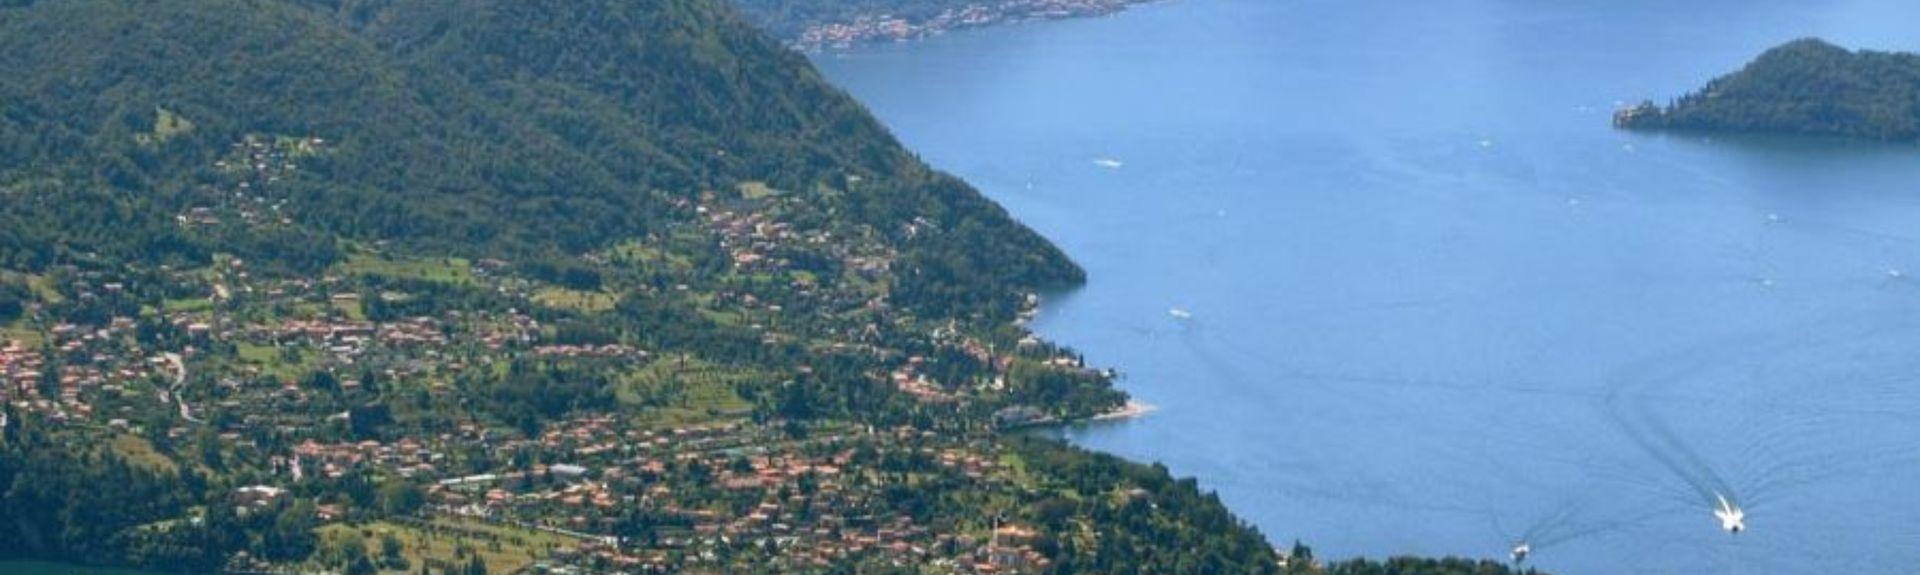 Moltrasio, Como, Lombardy, Italy